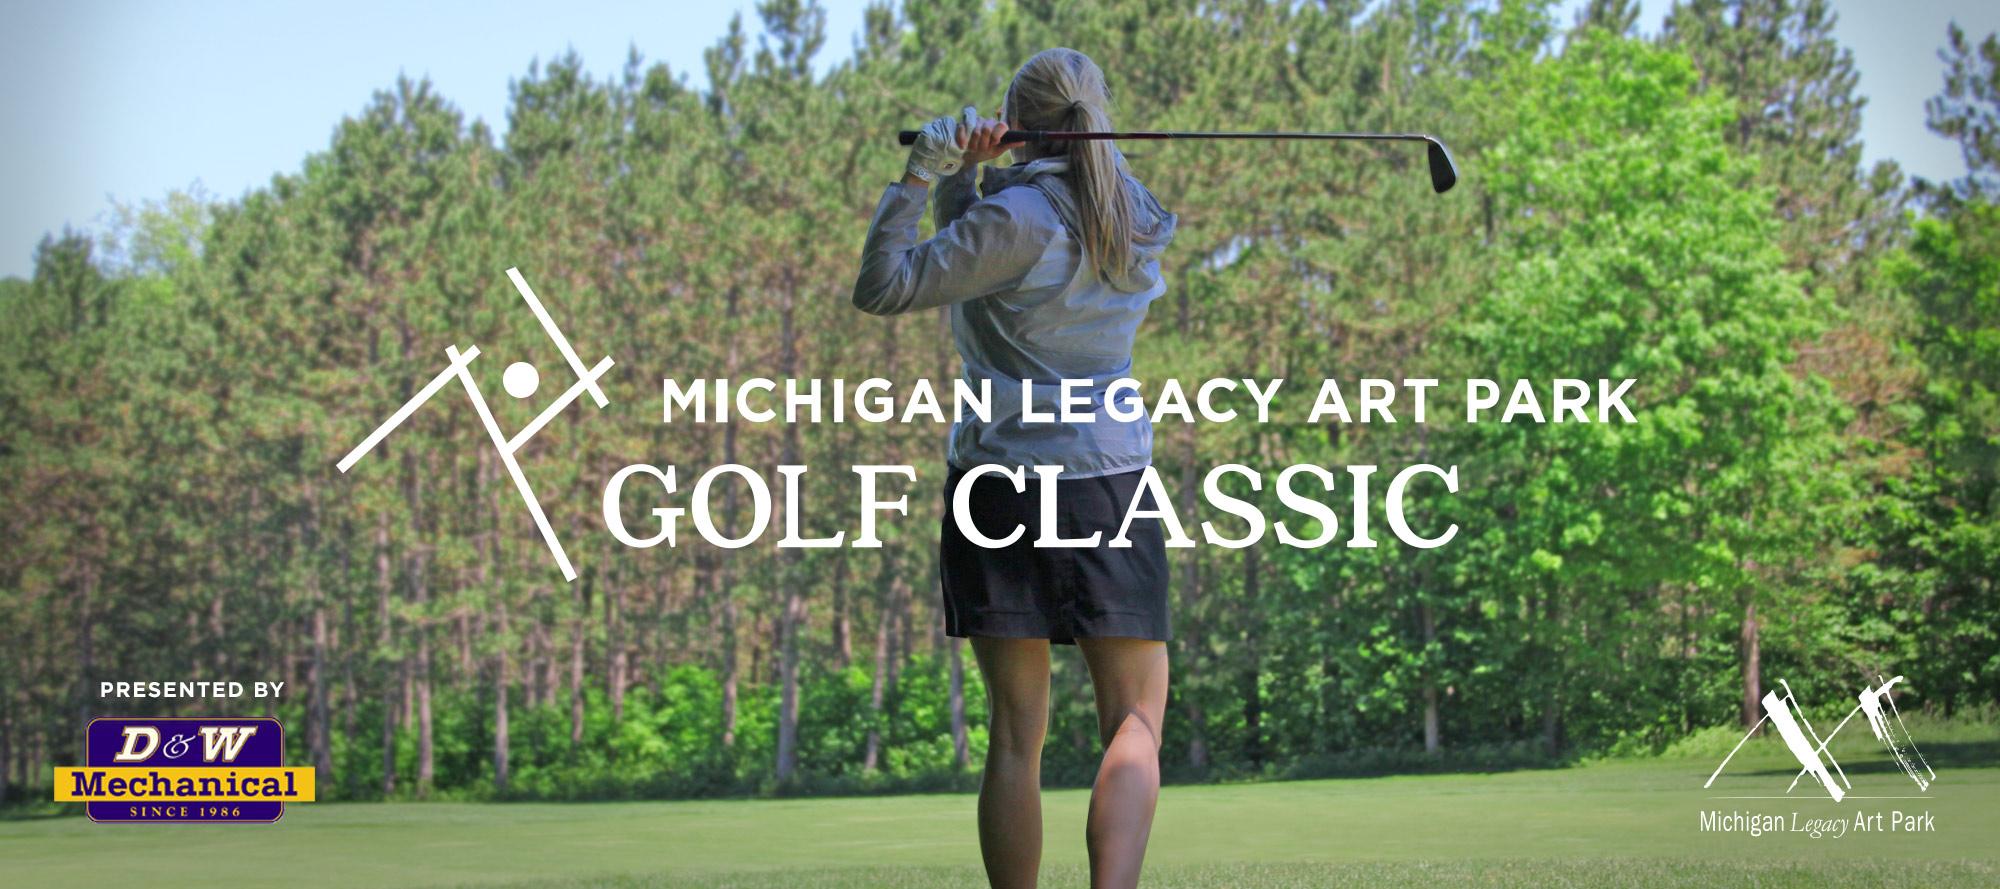 2018 Michigan Legacy Art Park Golf Classic